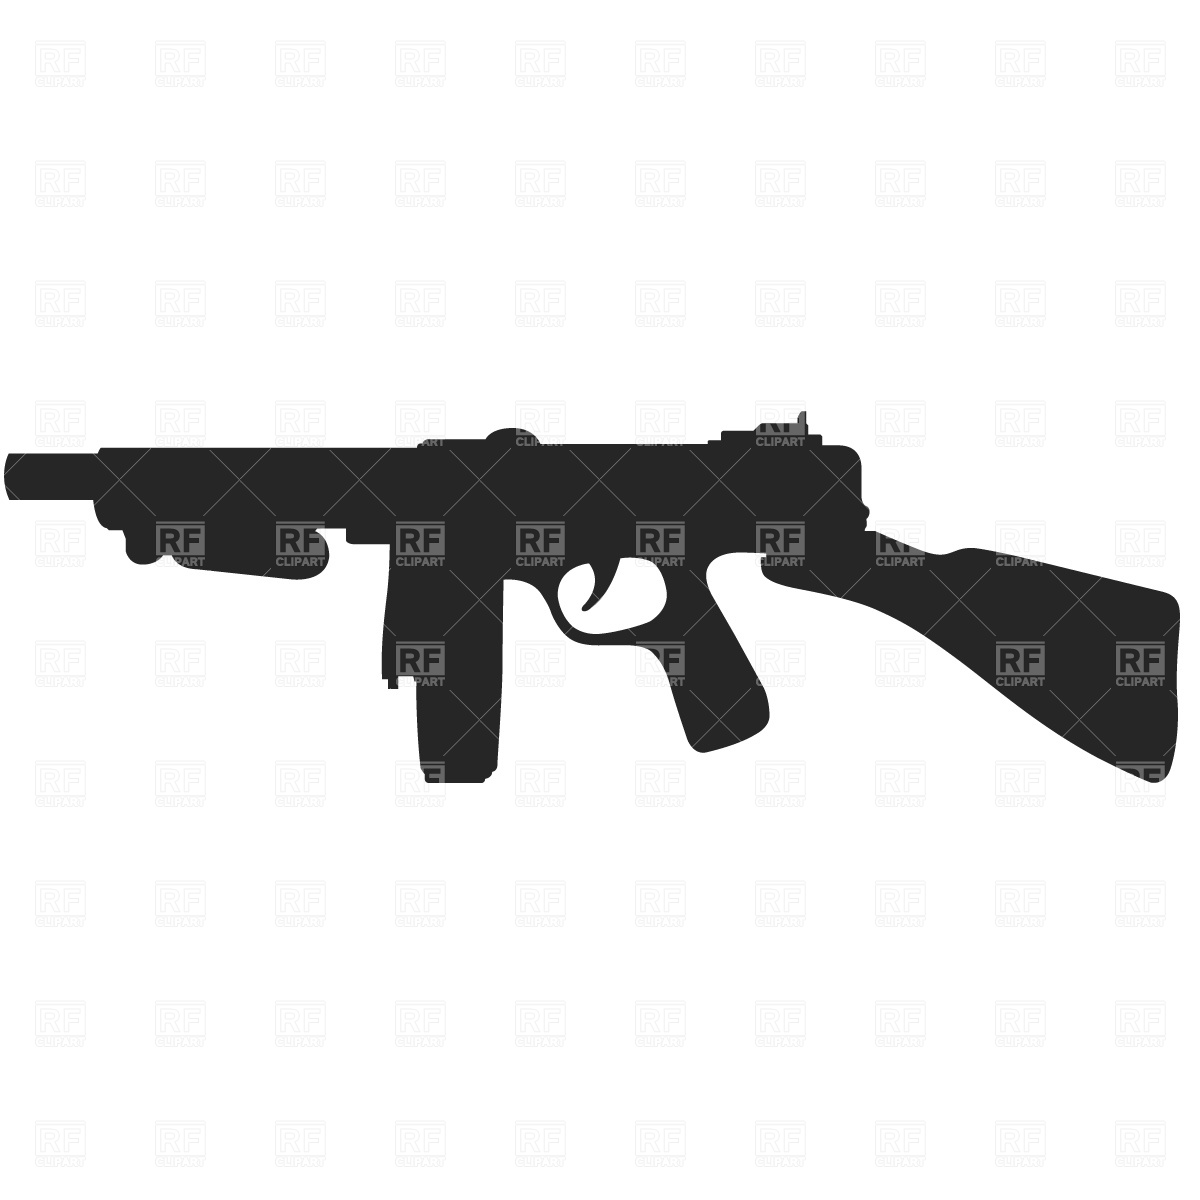 1200x1200 Gangster's Machine Gun Silhouette Royalty Free Vector Clip Art